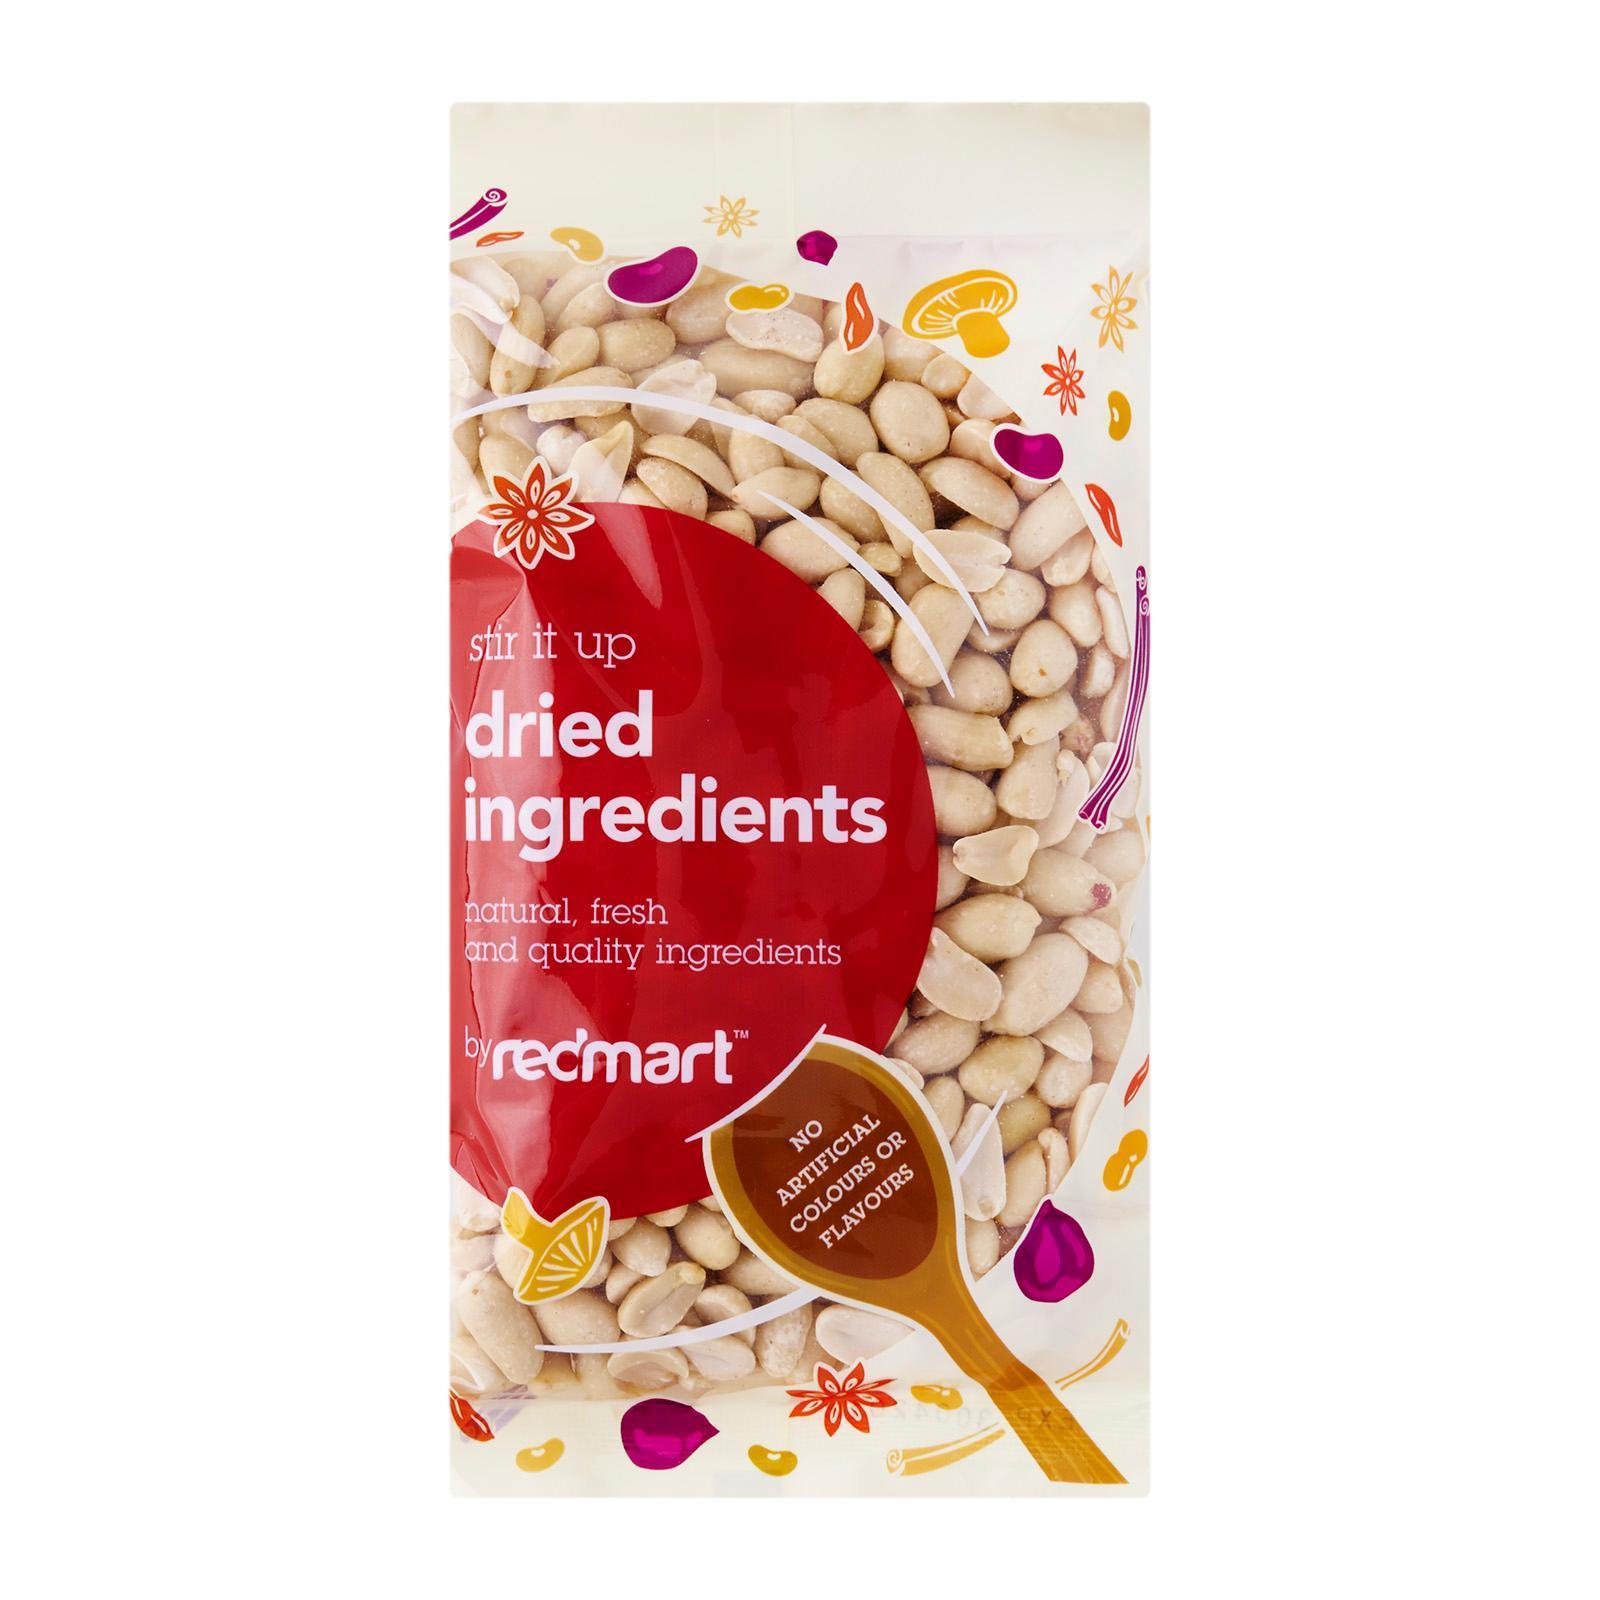 Redmart Skinless Raw Peanuts By Redmart.